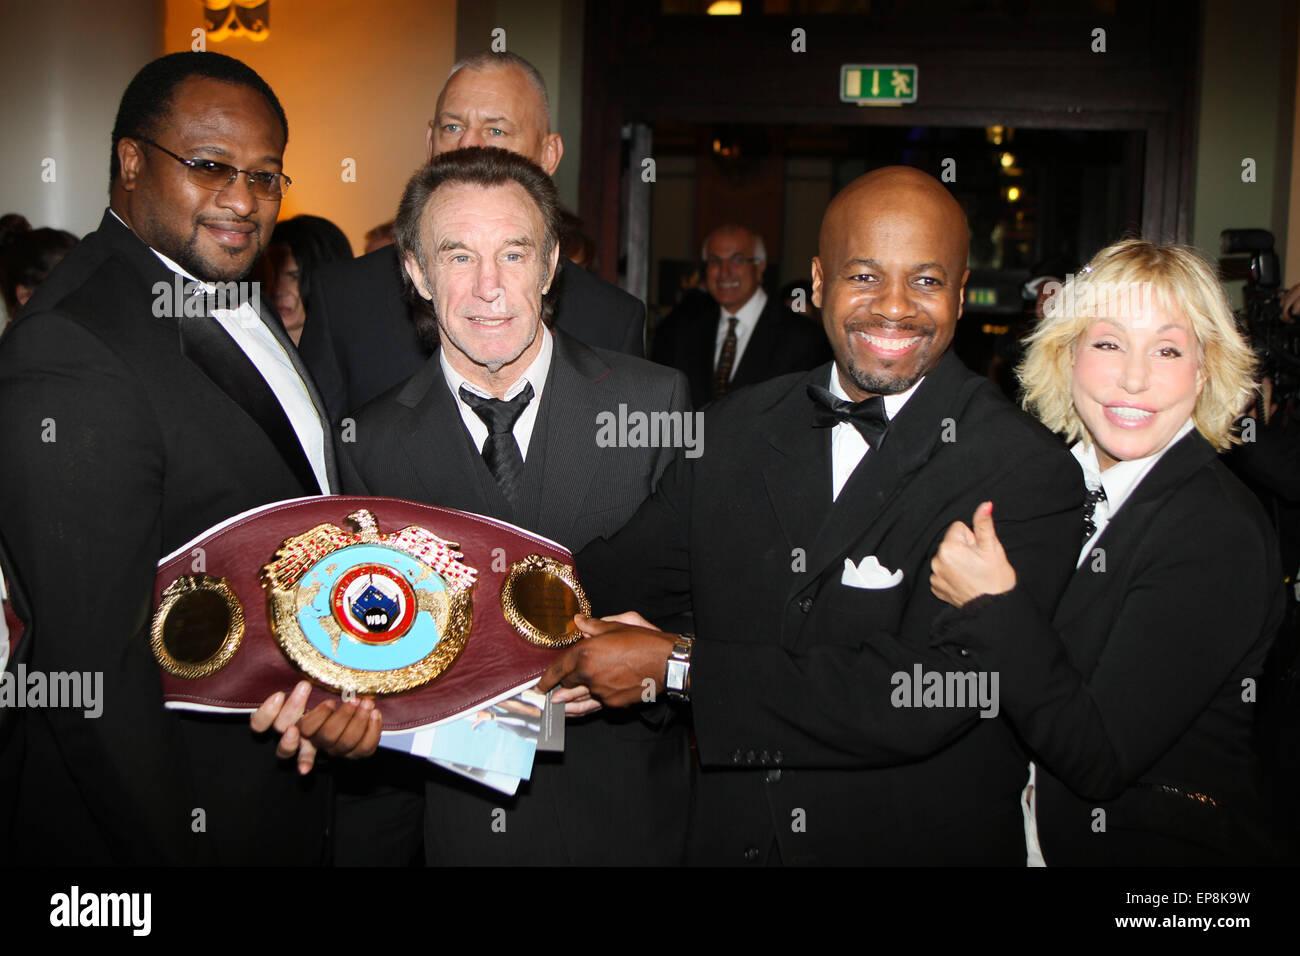 Sportpresseball - Français Sports Media Ball 2014 tenue à l'Alte Oper comprend: Lamon BREWSTER,Rene WELLER,Maria,Riddick Banque D'Images